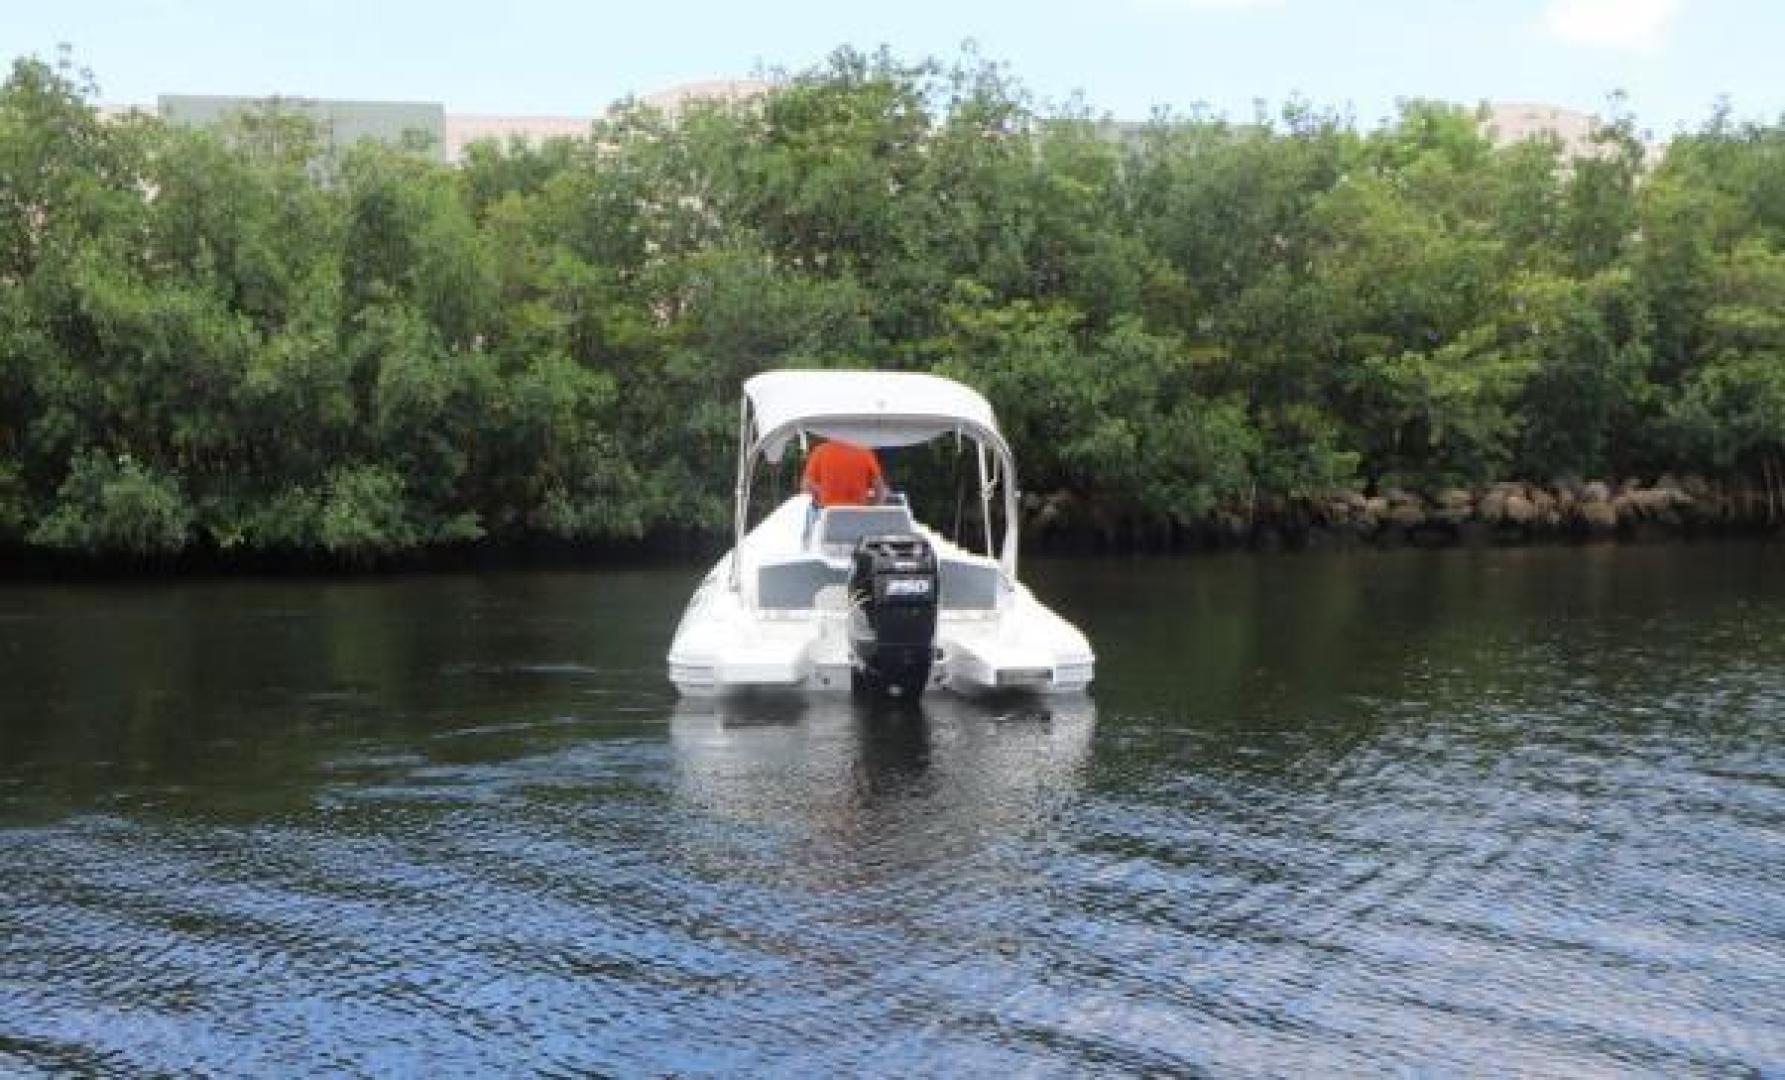 Sacs-Sport 700 2016-Sacs Sport 700 Fort Lauderdale-Florida-United States-1521563 | Thumbnail